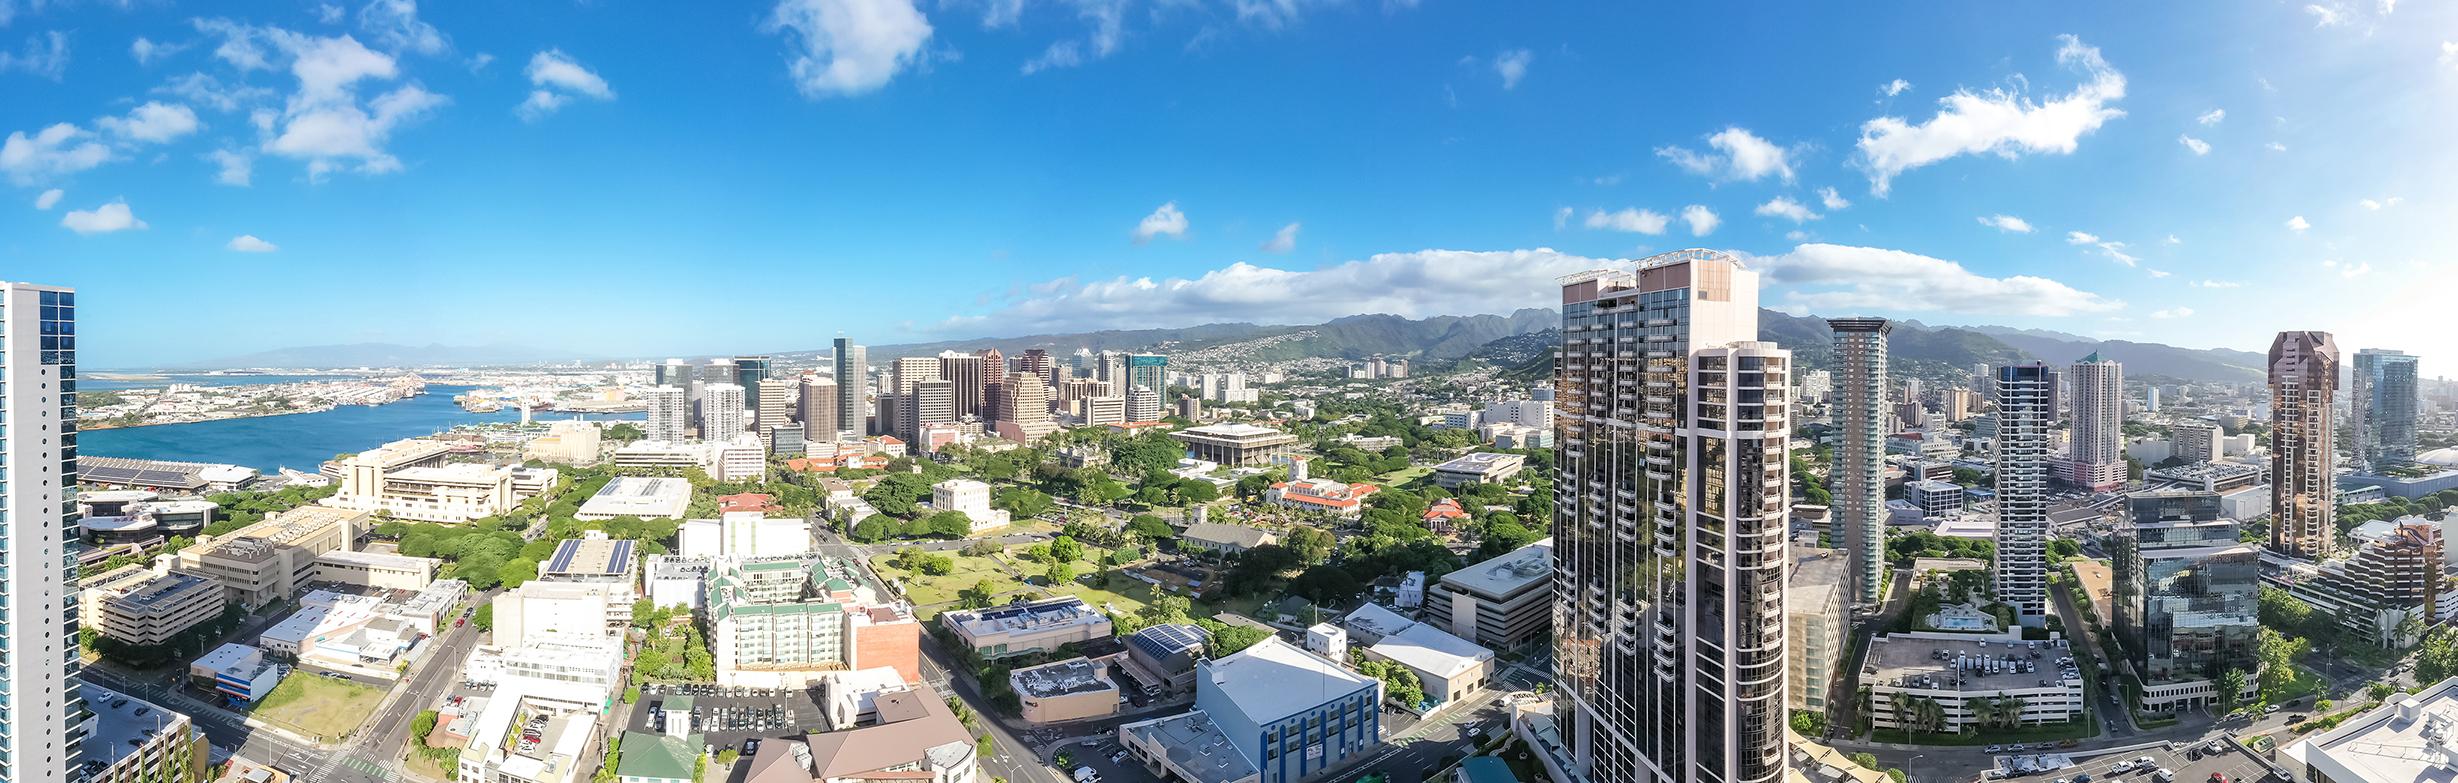 Ililani Ewa/Mountain View 38th Floor